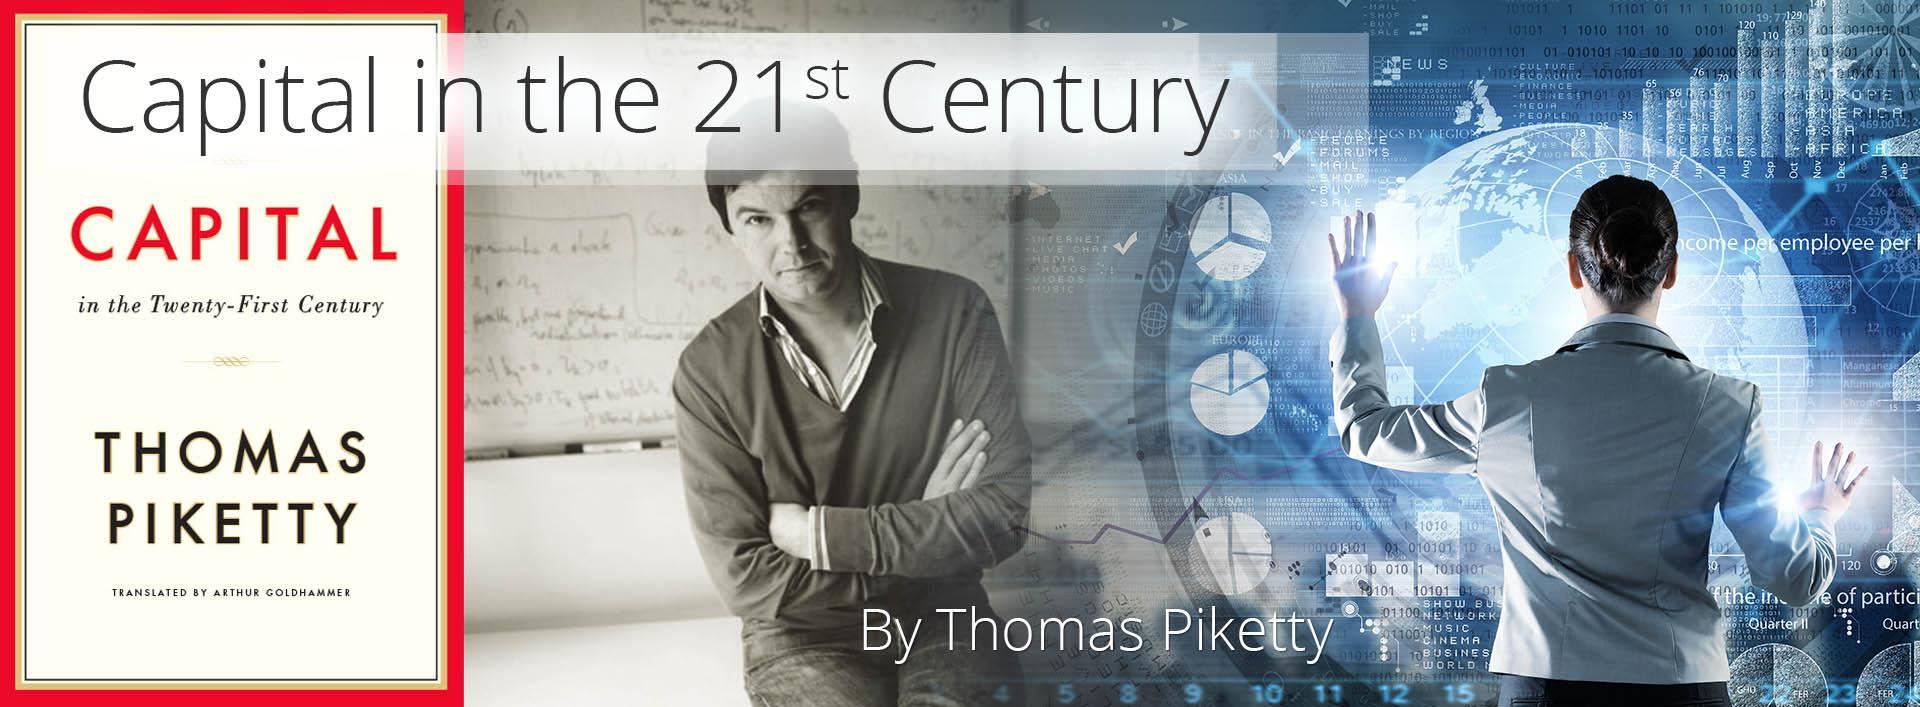 Capital in 21st Century